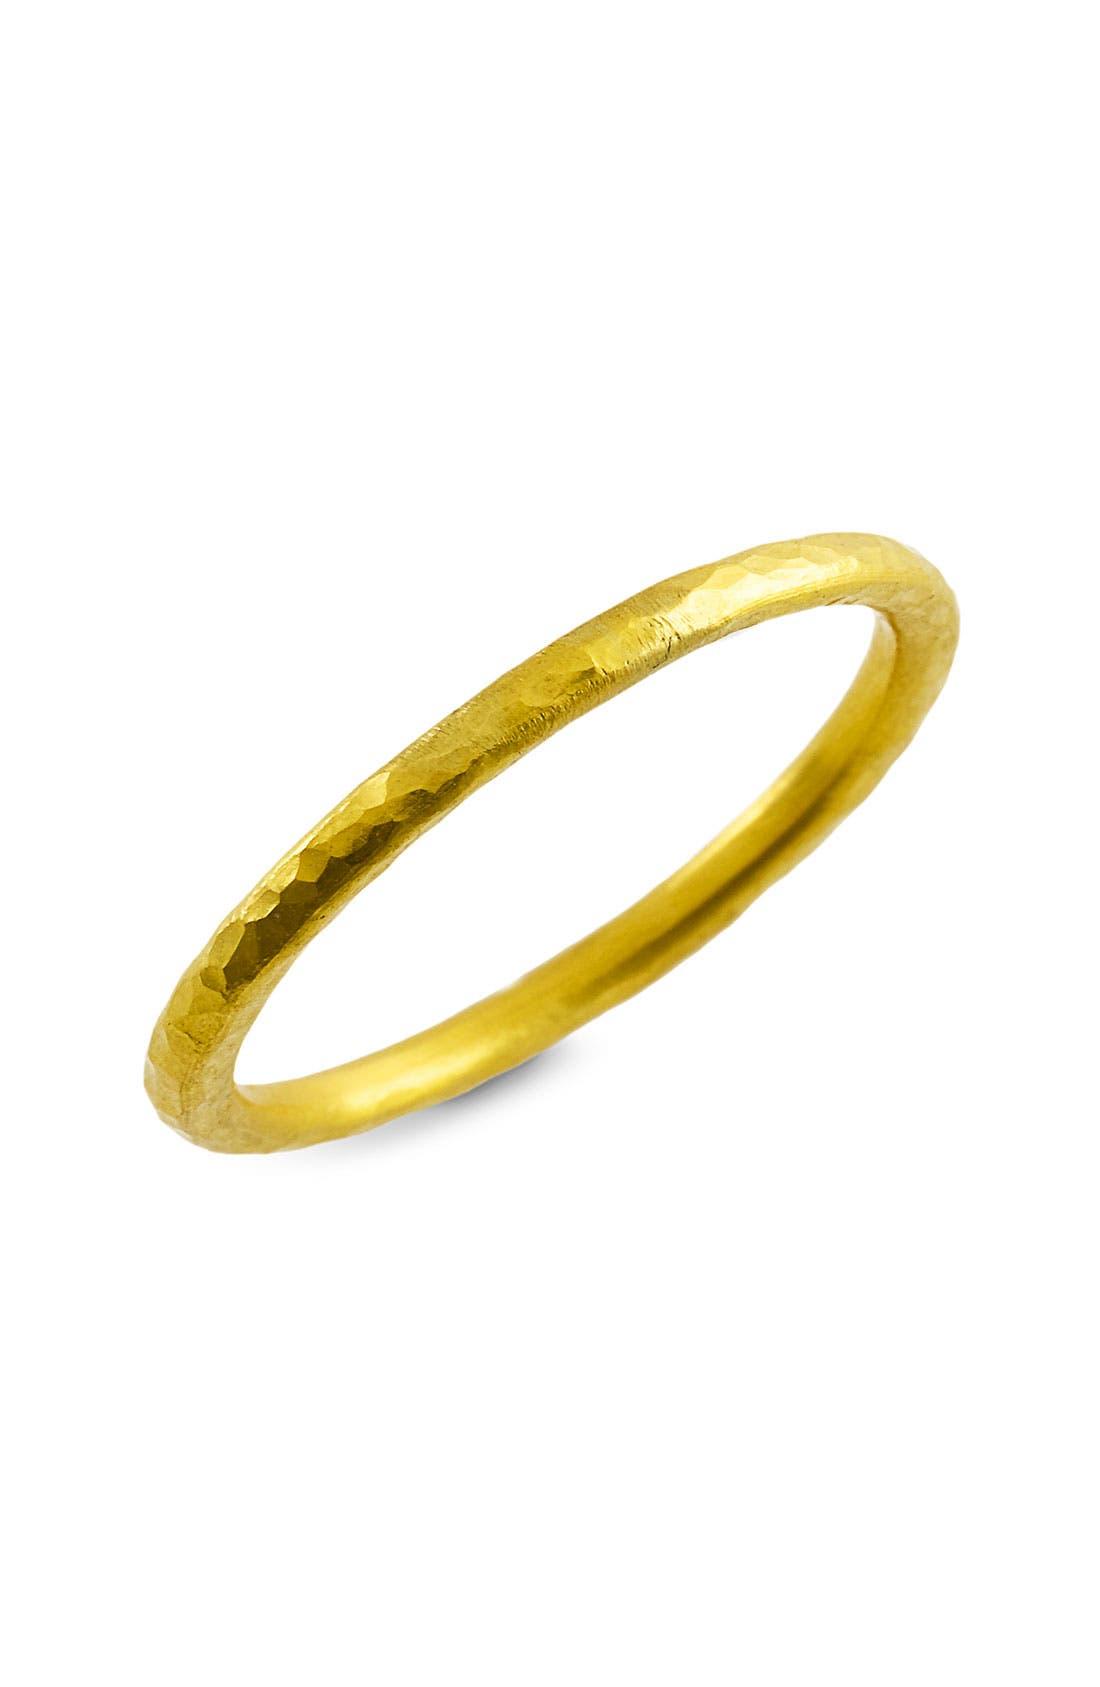 Main Image - Gurhan Slender Gold Ring